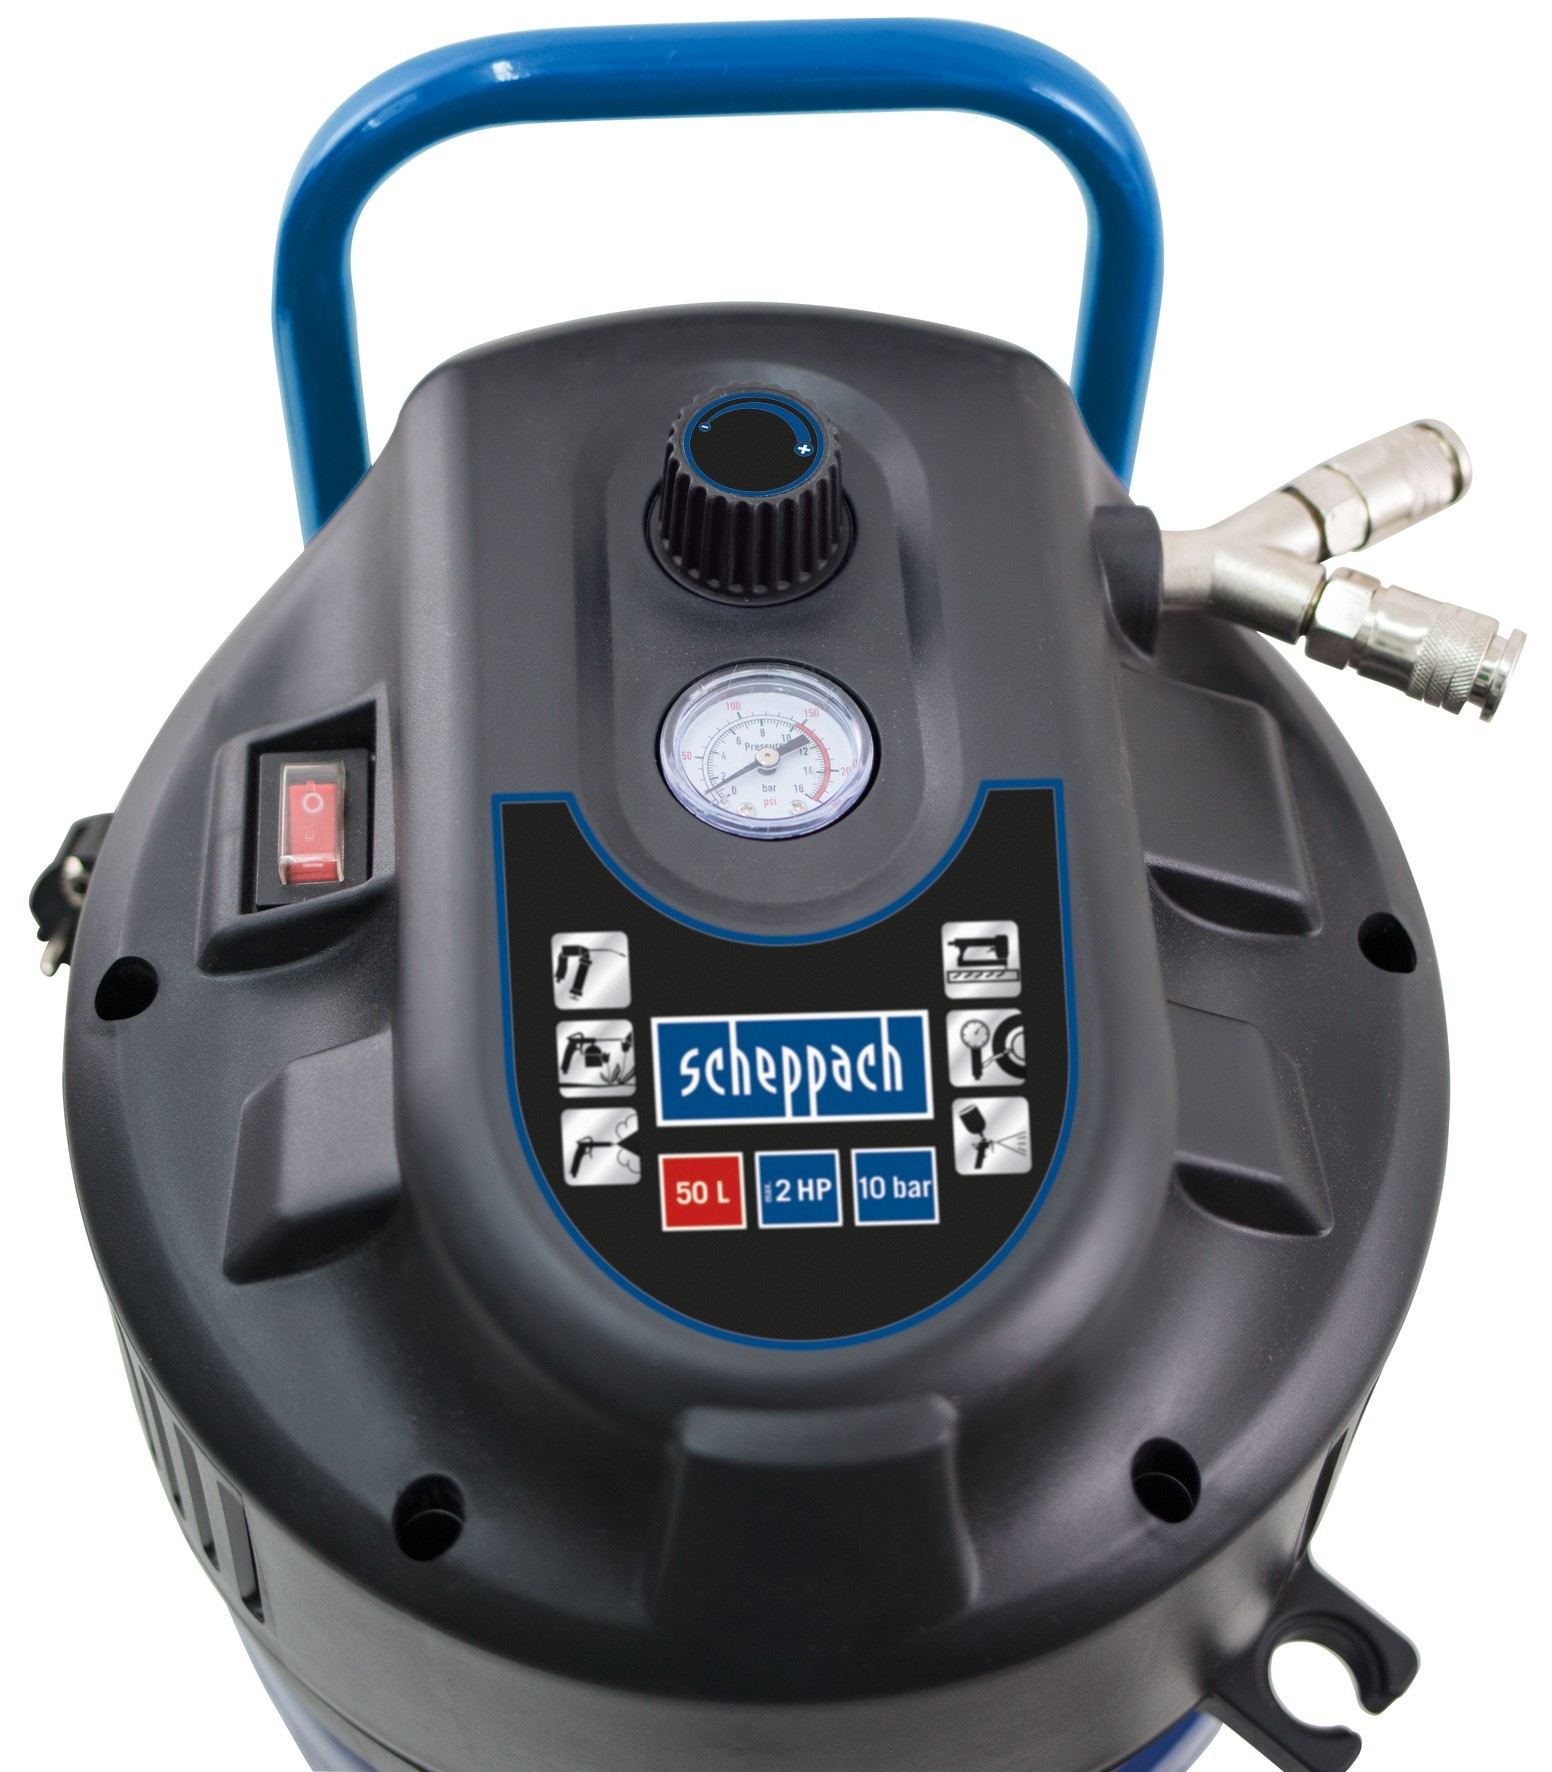 Scheppach Kompressor HC51V 10 bar 50 Liter 230V 1500W Bild 2